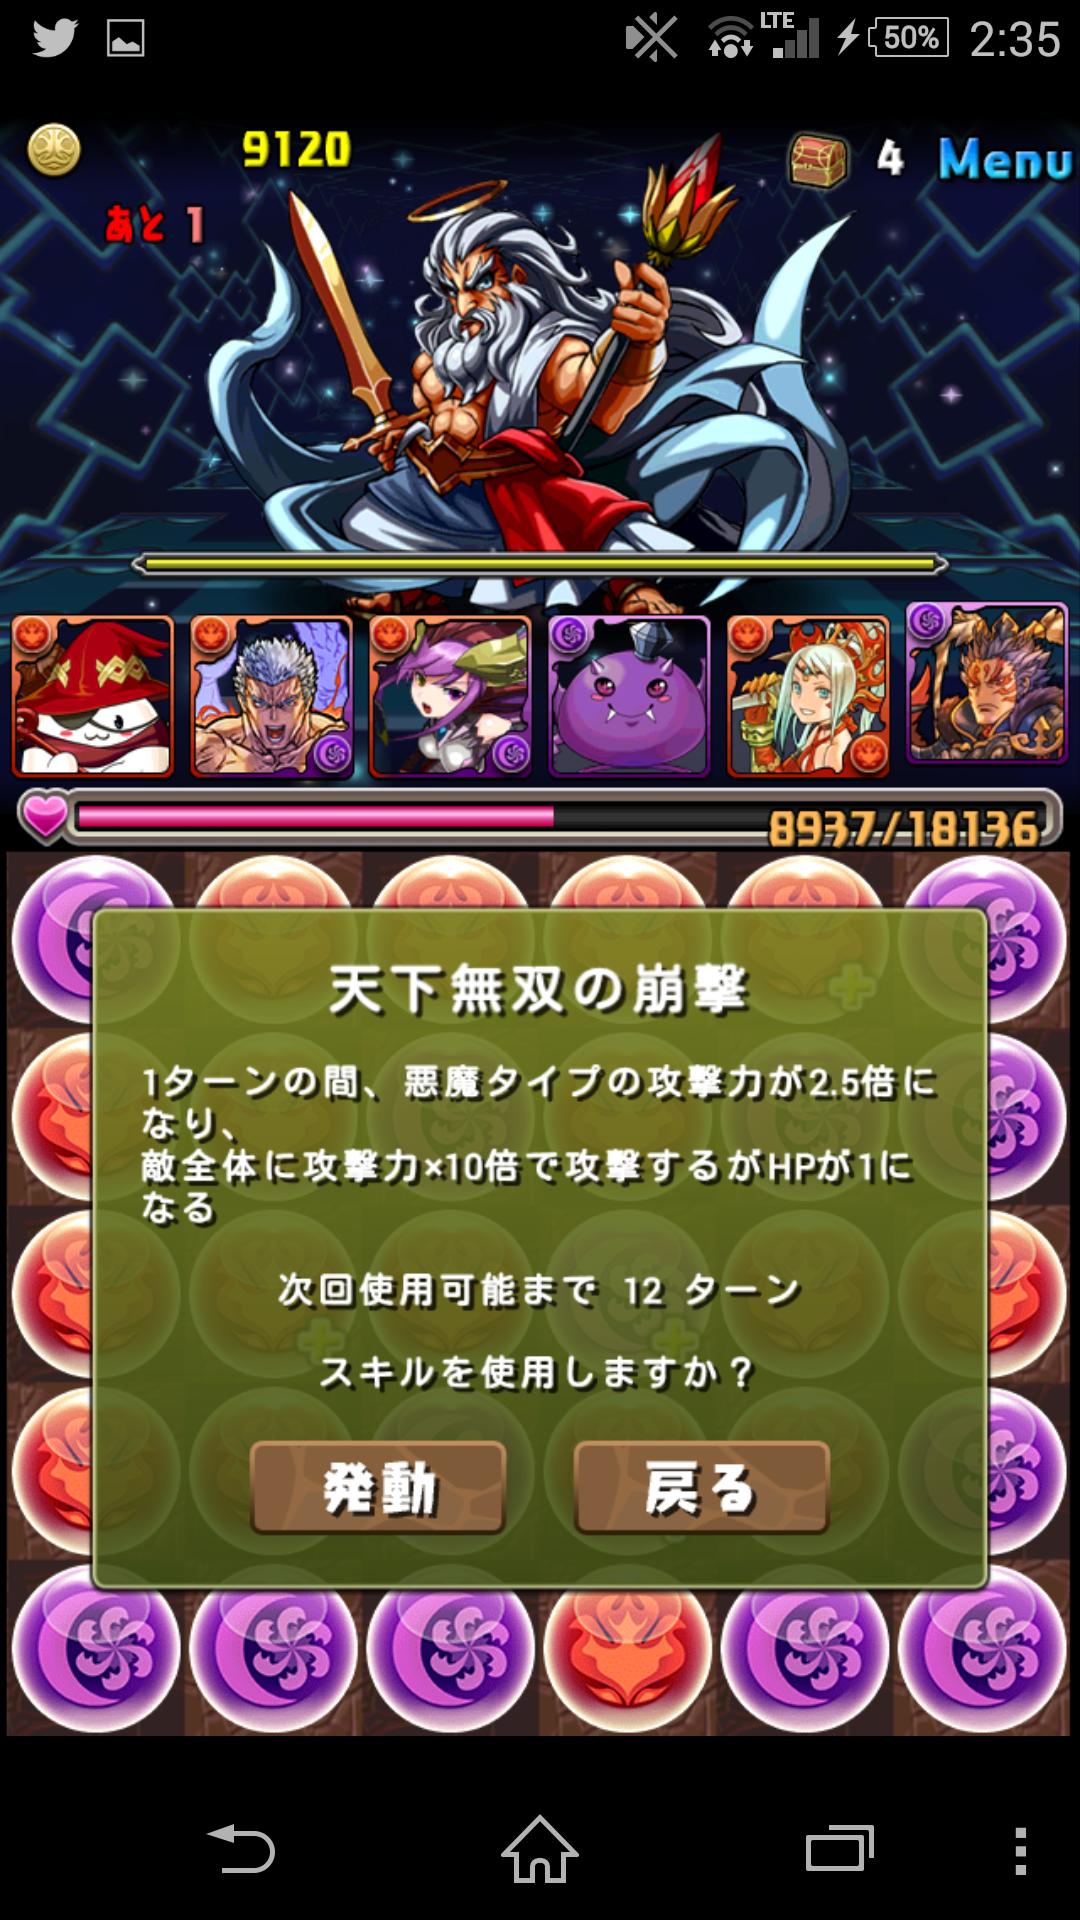 Screenshot_2015-02-18-02-35-56.png